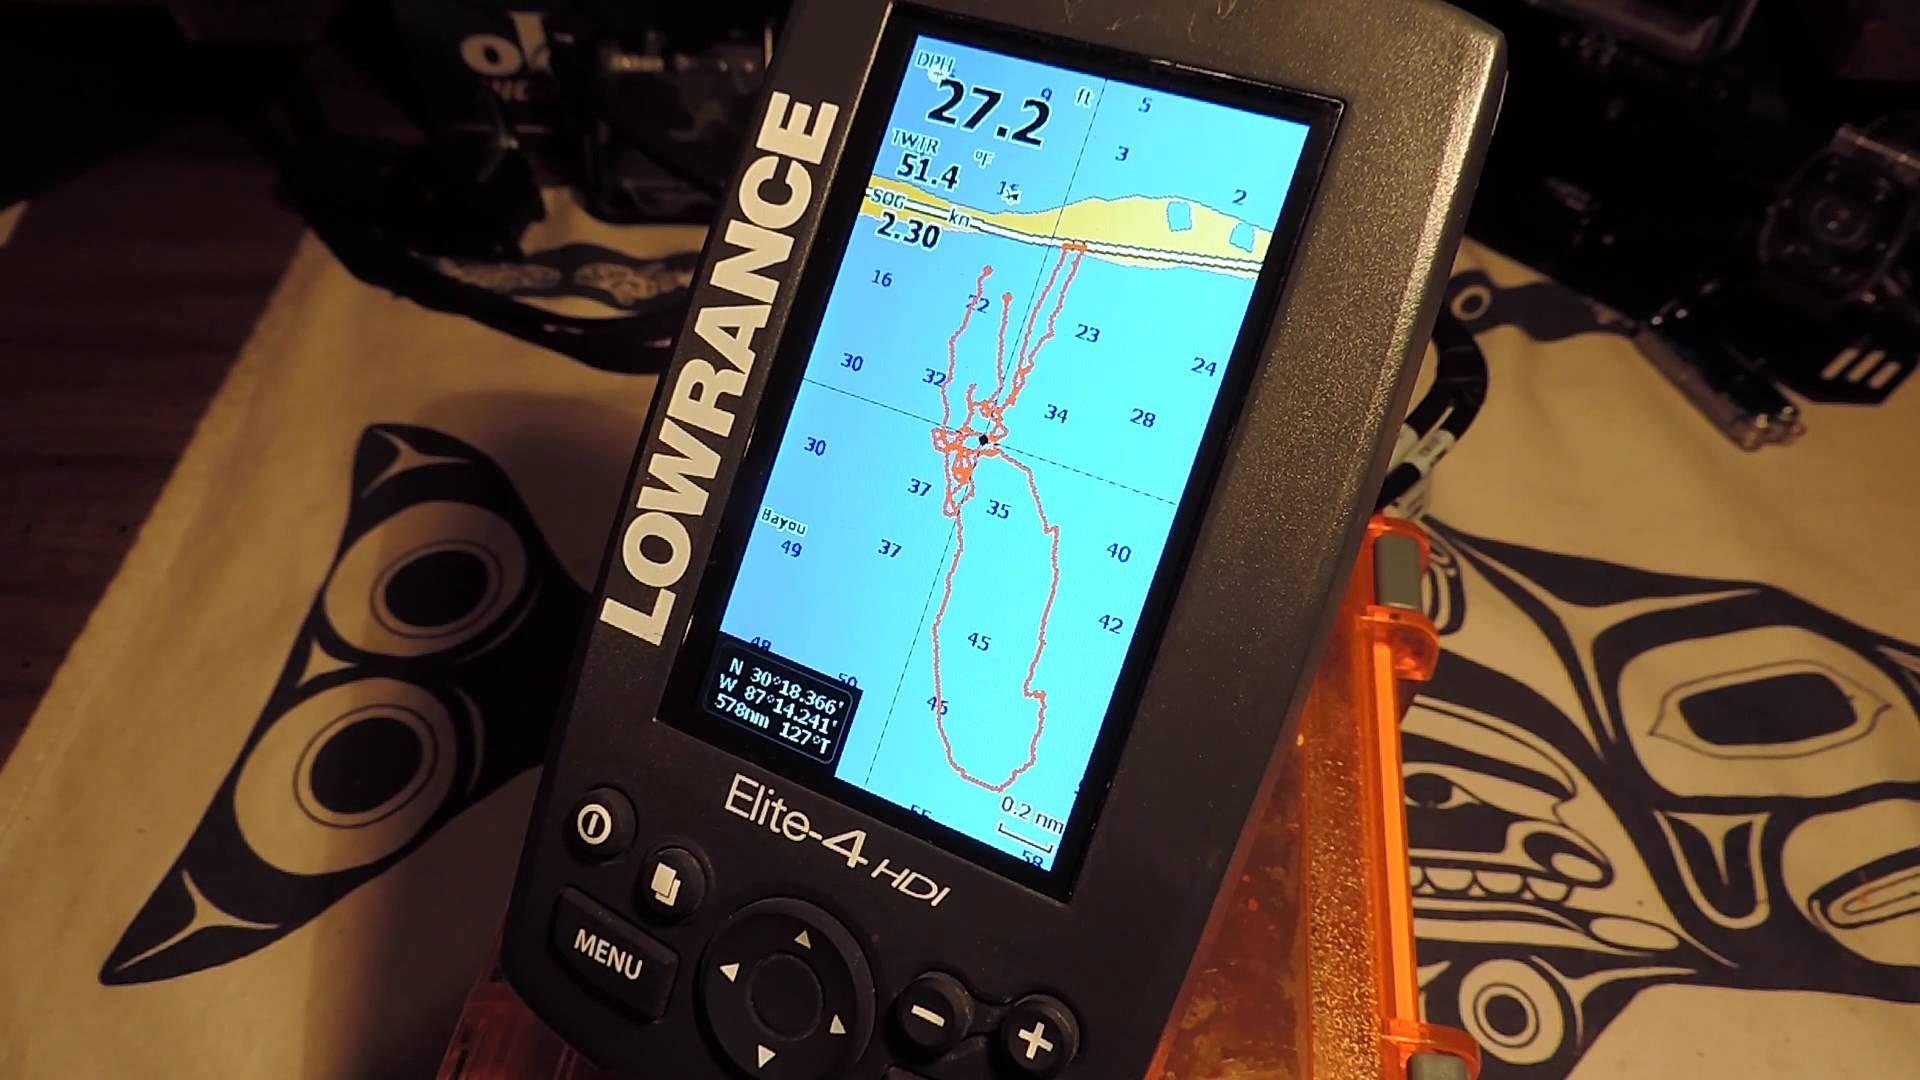 Lowrance Elite 4 HDI GPS Tips Gps units, Fish finder